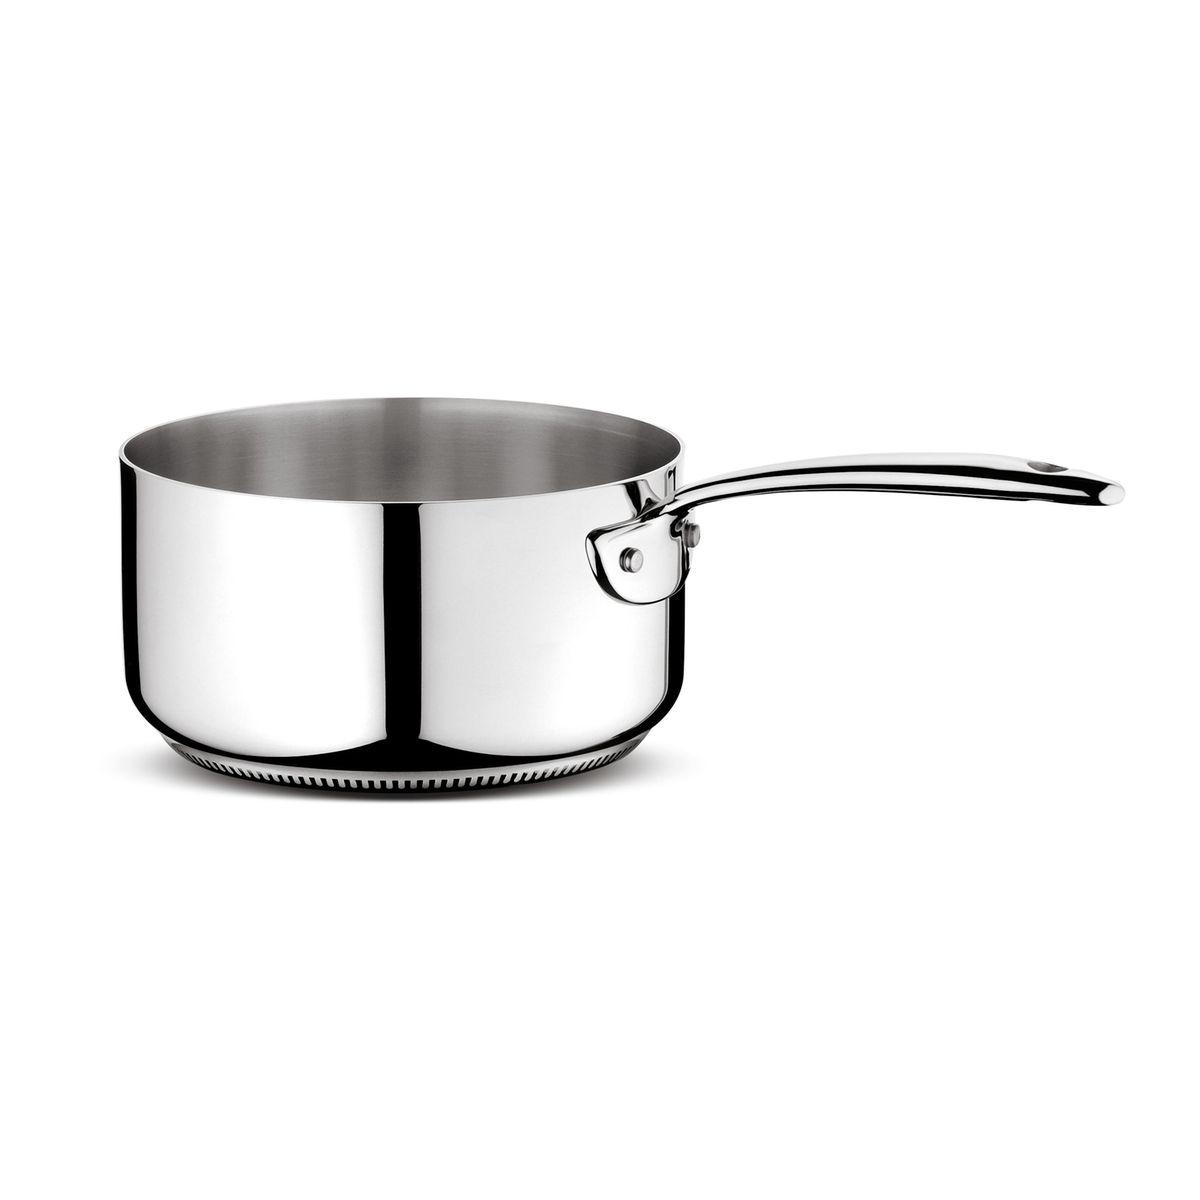 lagostina - casserole inox 16cm - 011115031116